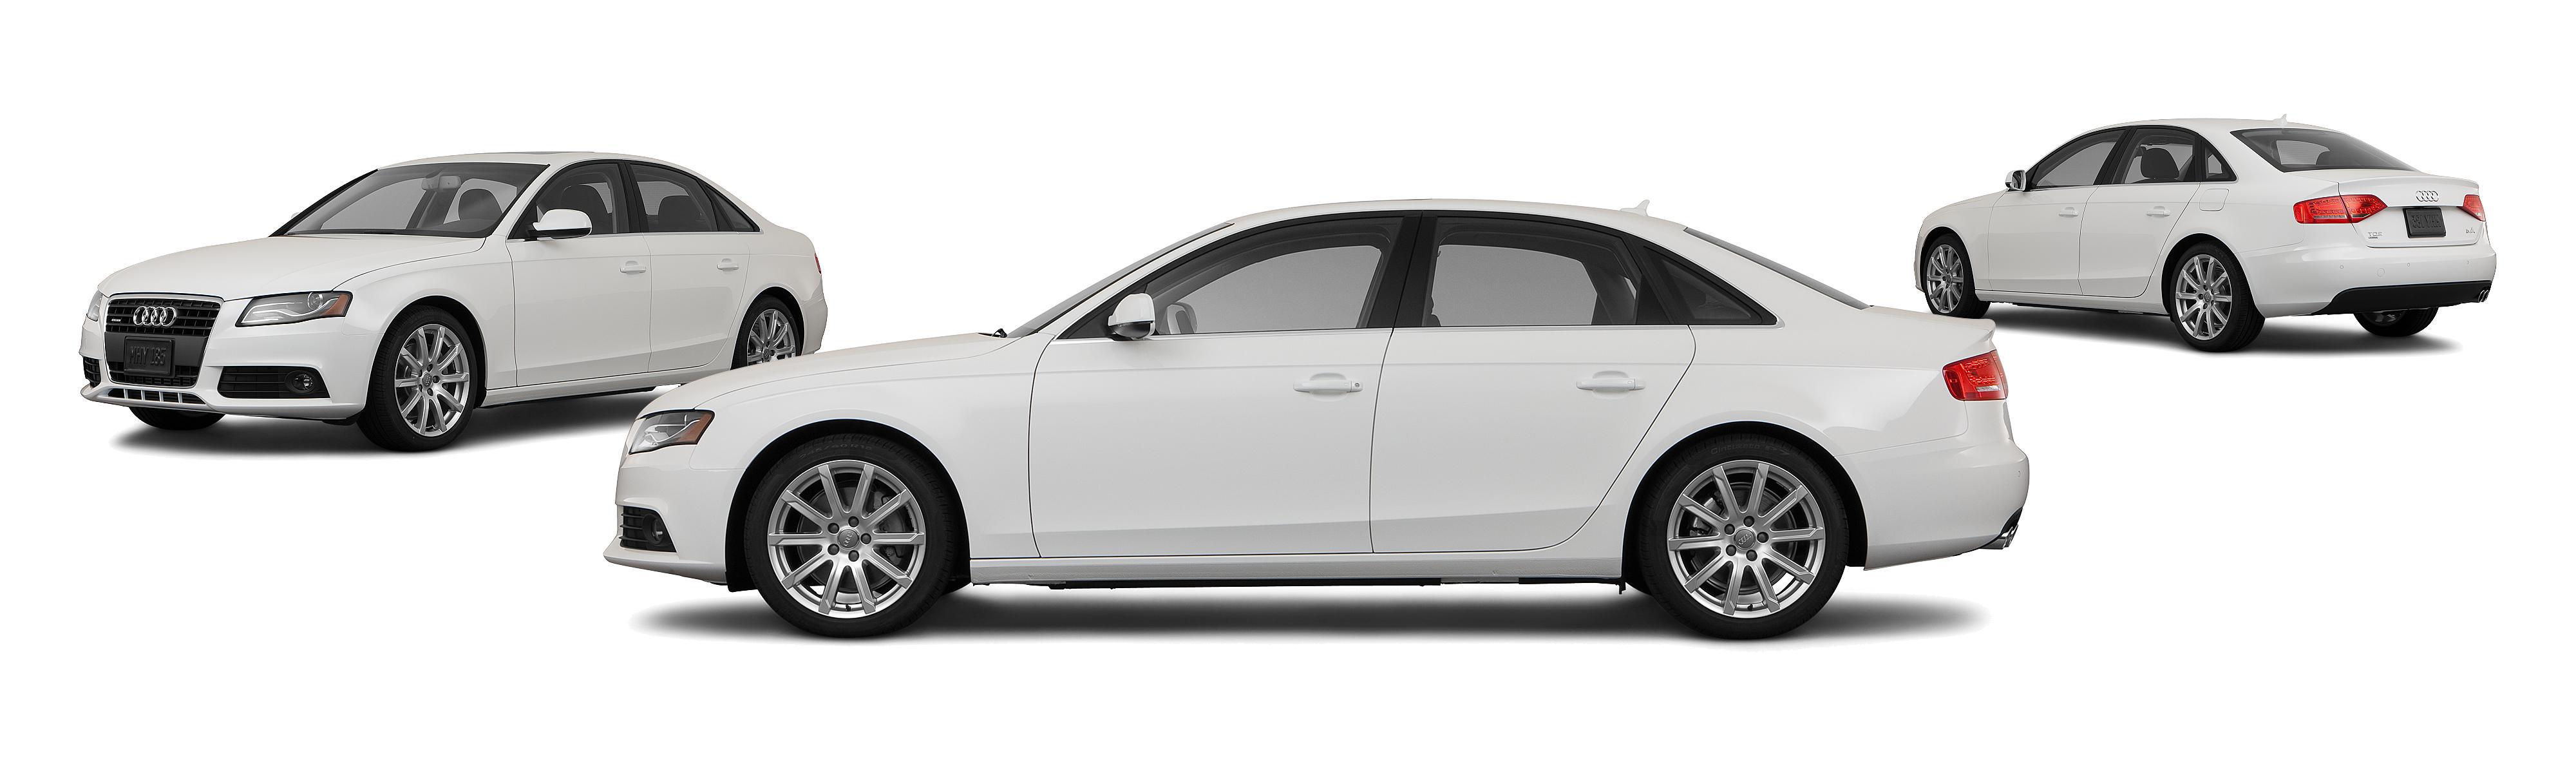 2011 Audi A4 Awd 20t Quattro Premium Plus 4dr Sedan 8a Research White Black Rims Groovecar